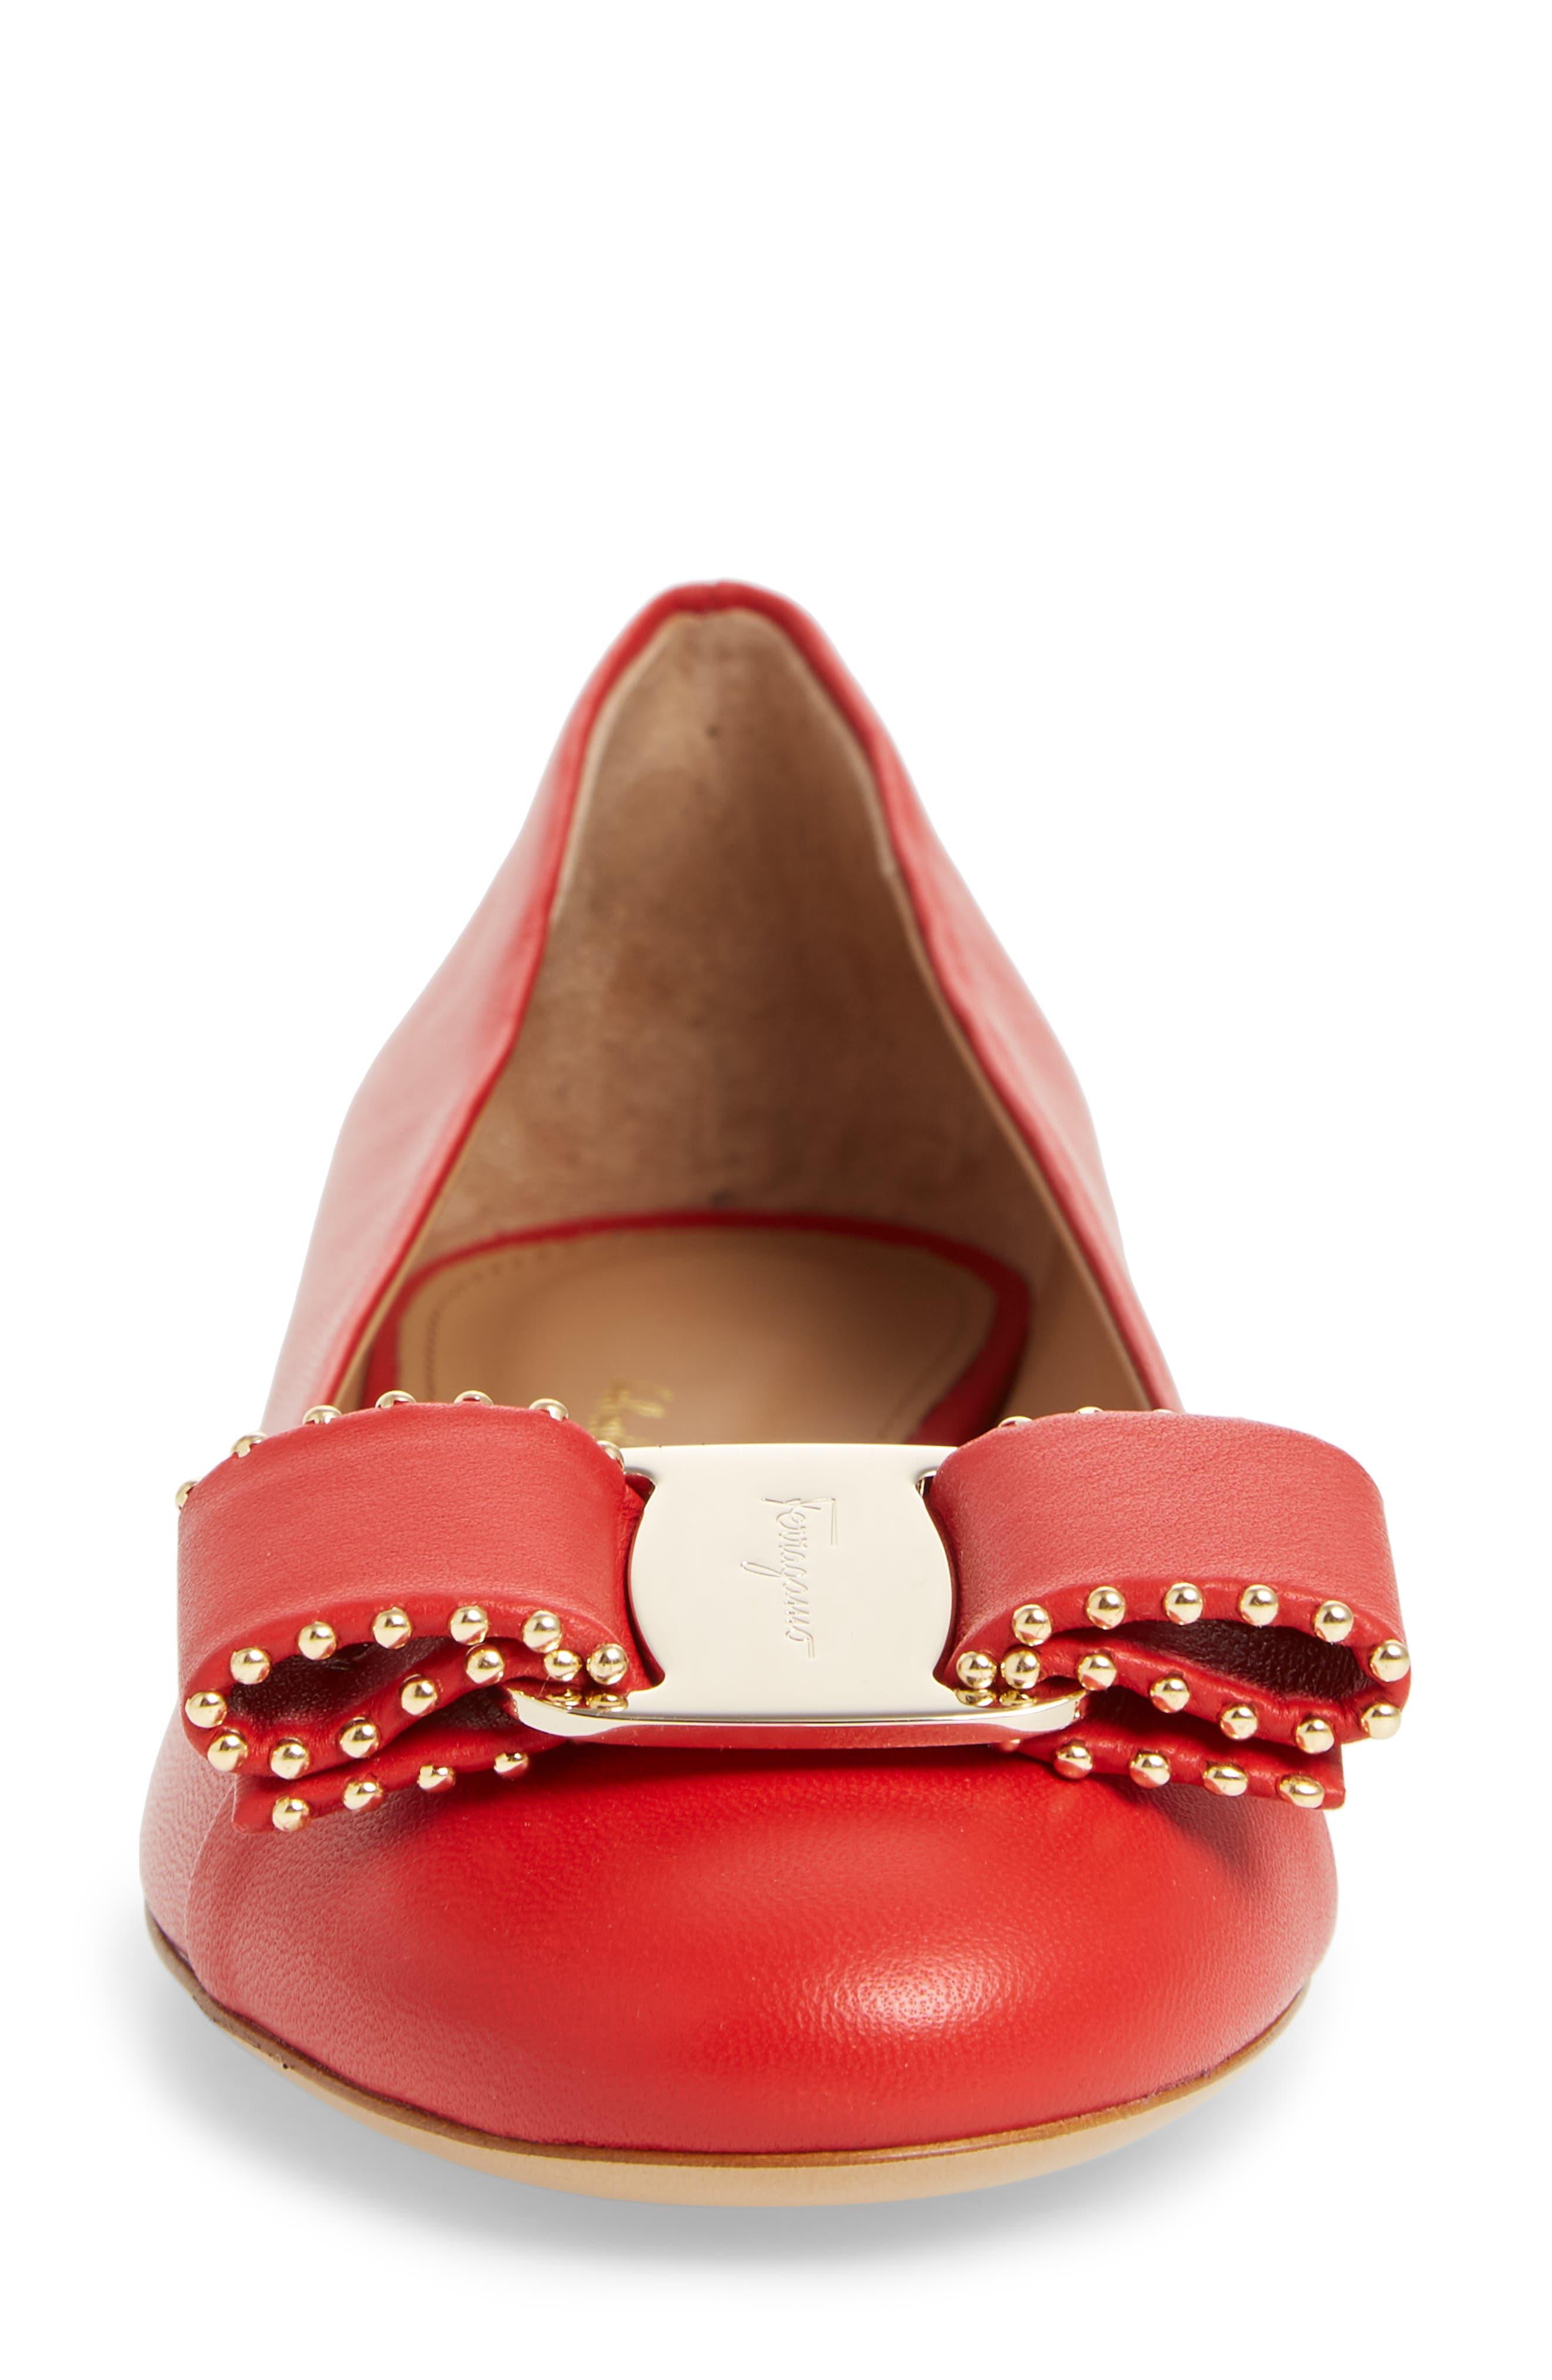 Varina Leather Flat,                             Alternate thumbnail 4, color,                             Lipstick Pink